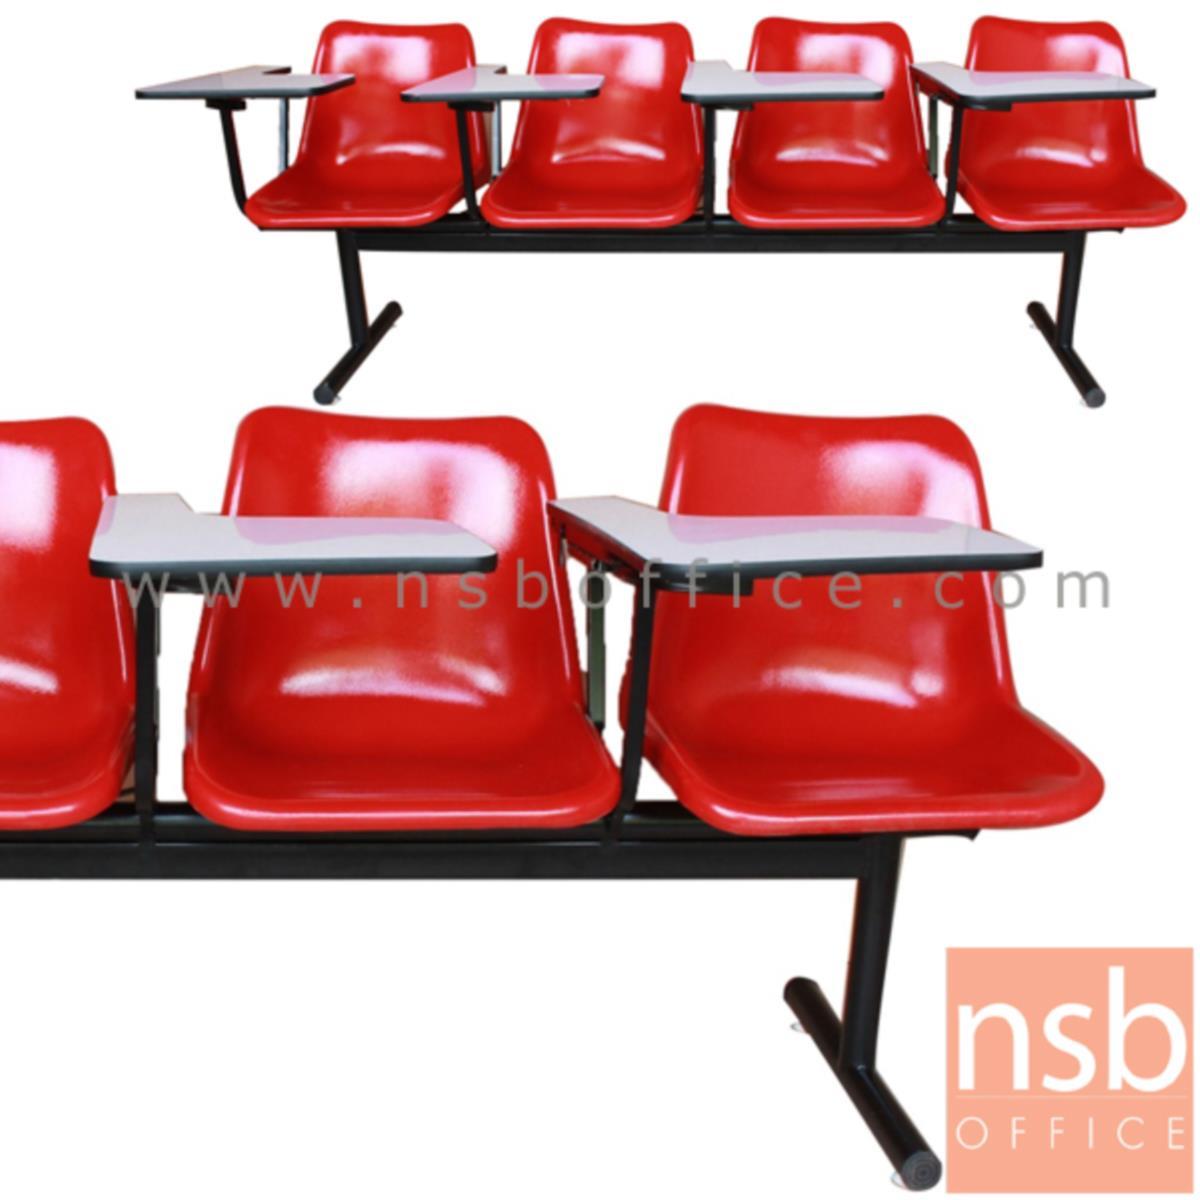 B07A012:เก้าอี้เลคเชอร์แถวเฟรมโพลี่ รุ่น Indigo (อินดิโก) 2 ,3 ,4 และ 5 ที่นั่ง ขาเหล็กกลม